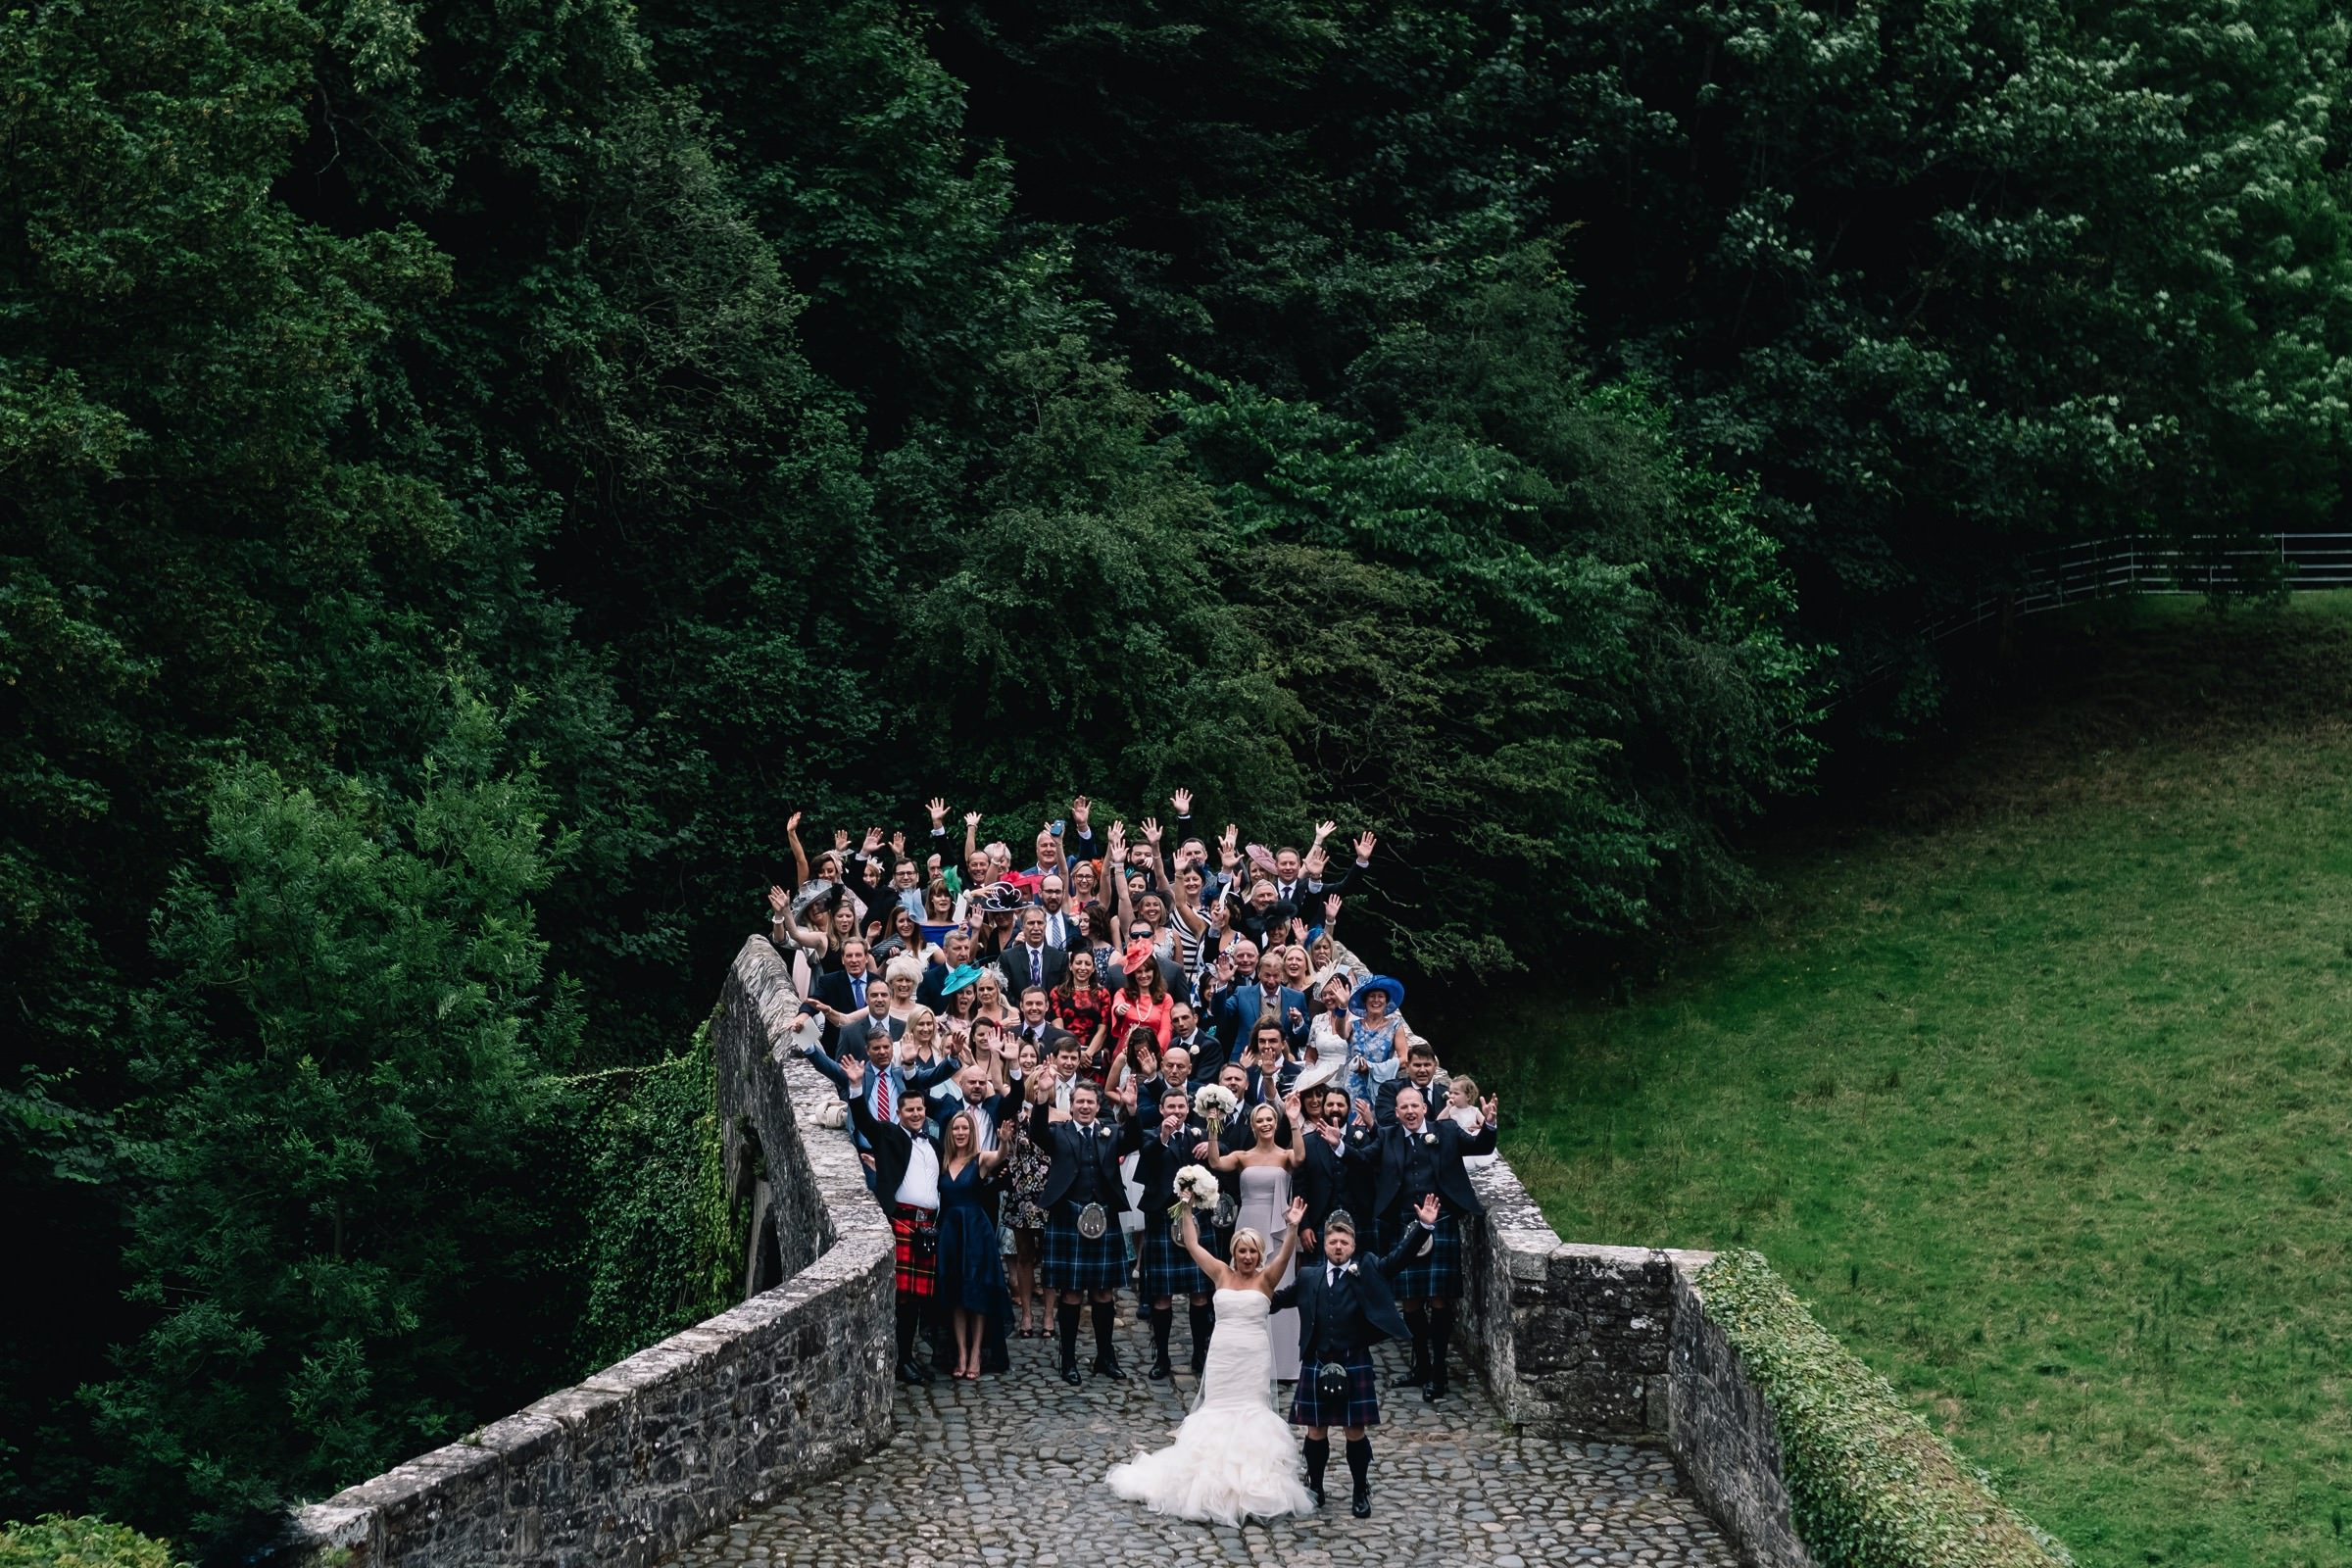 Group photograph on Brig o' Doon bridge